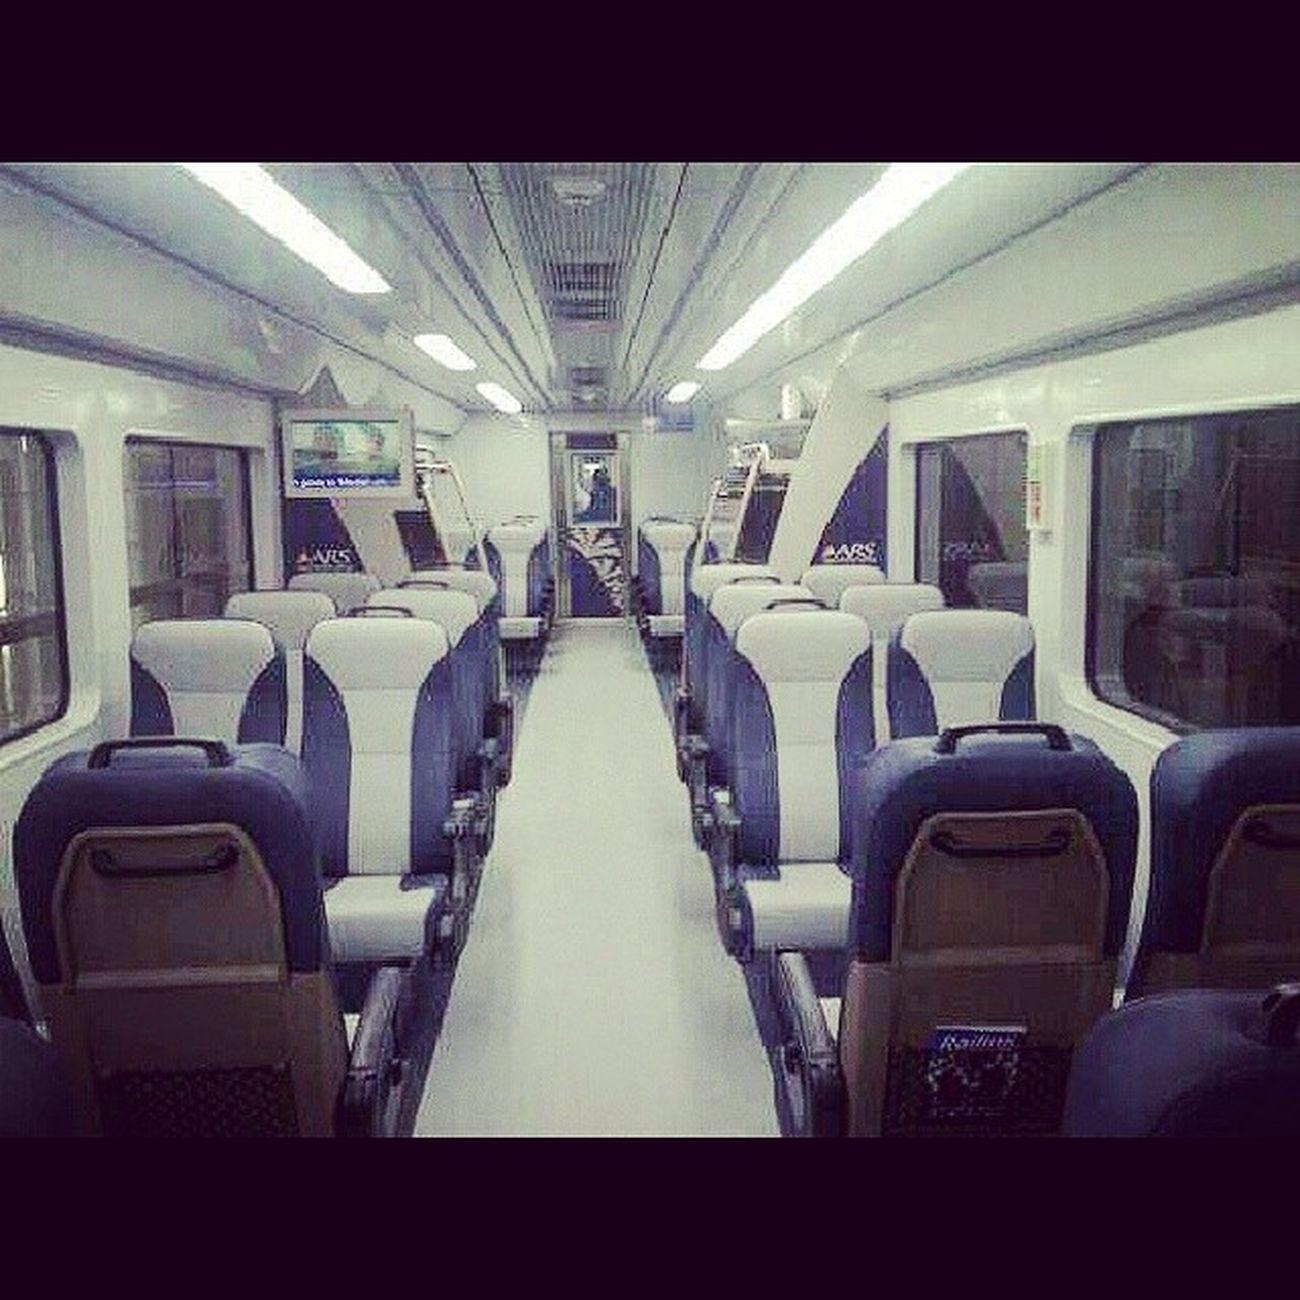 Ini milik PTKAI Inka Kai Railfans